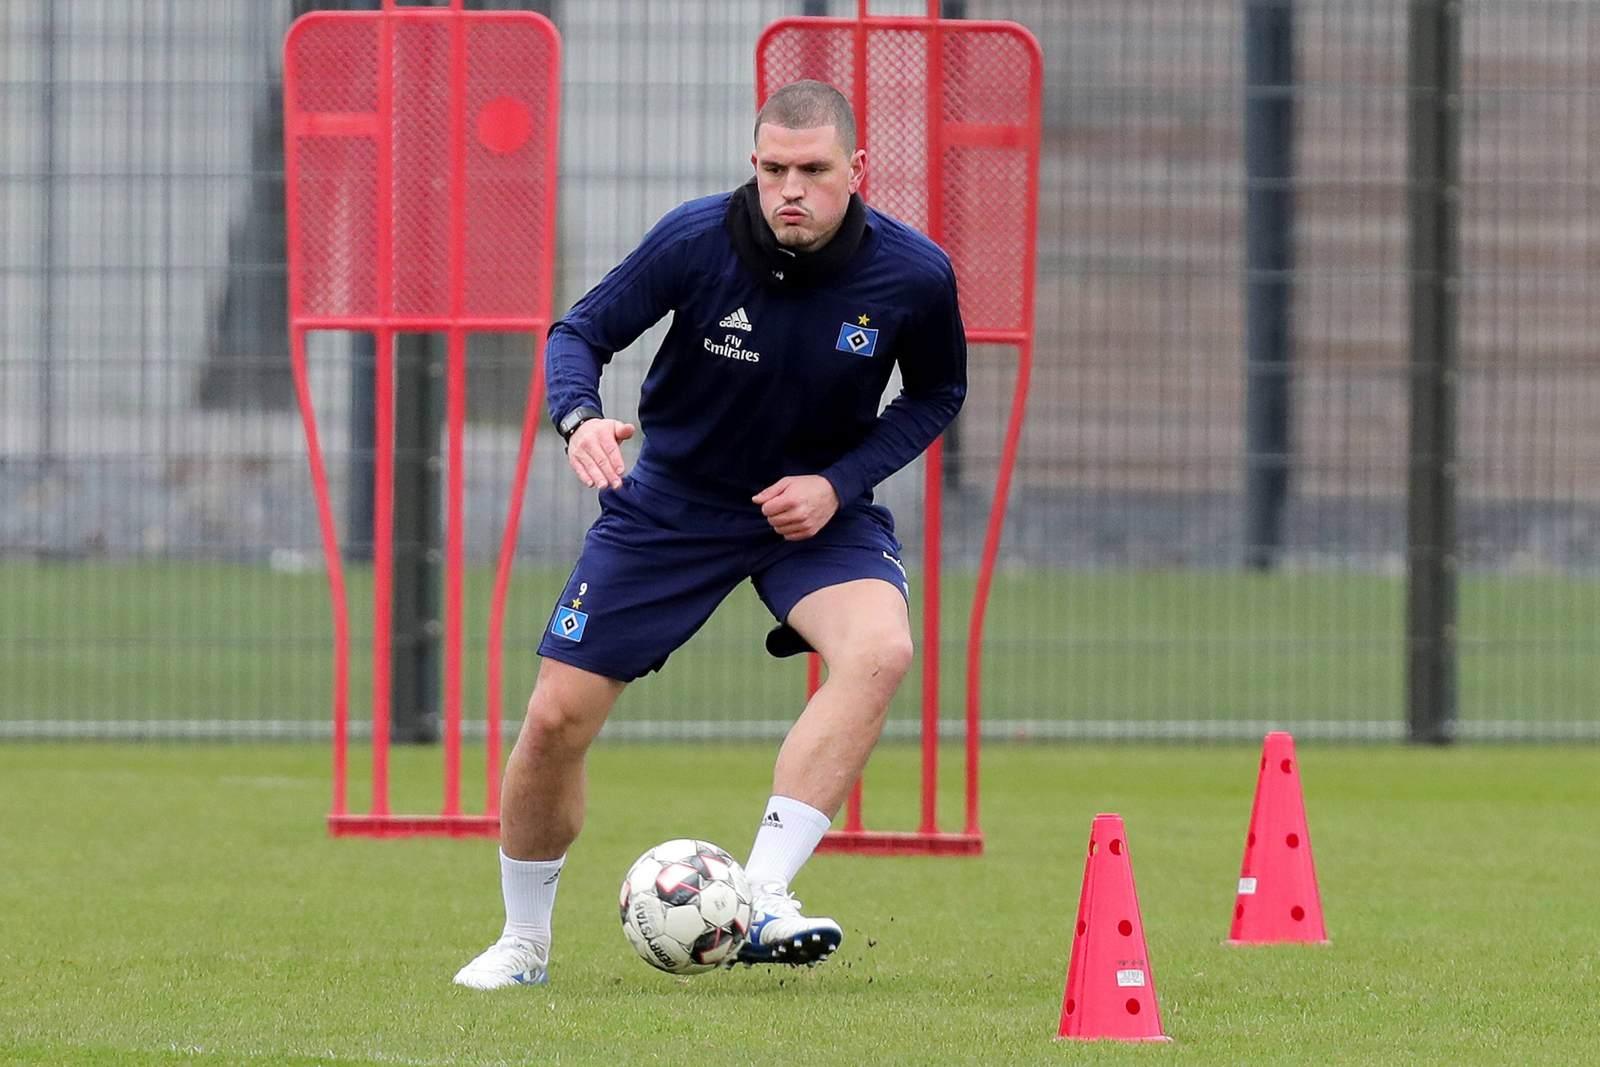 Kyriakos Papadopoulos im Training mit dem Ball am Fuß